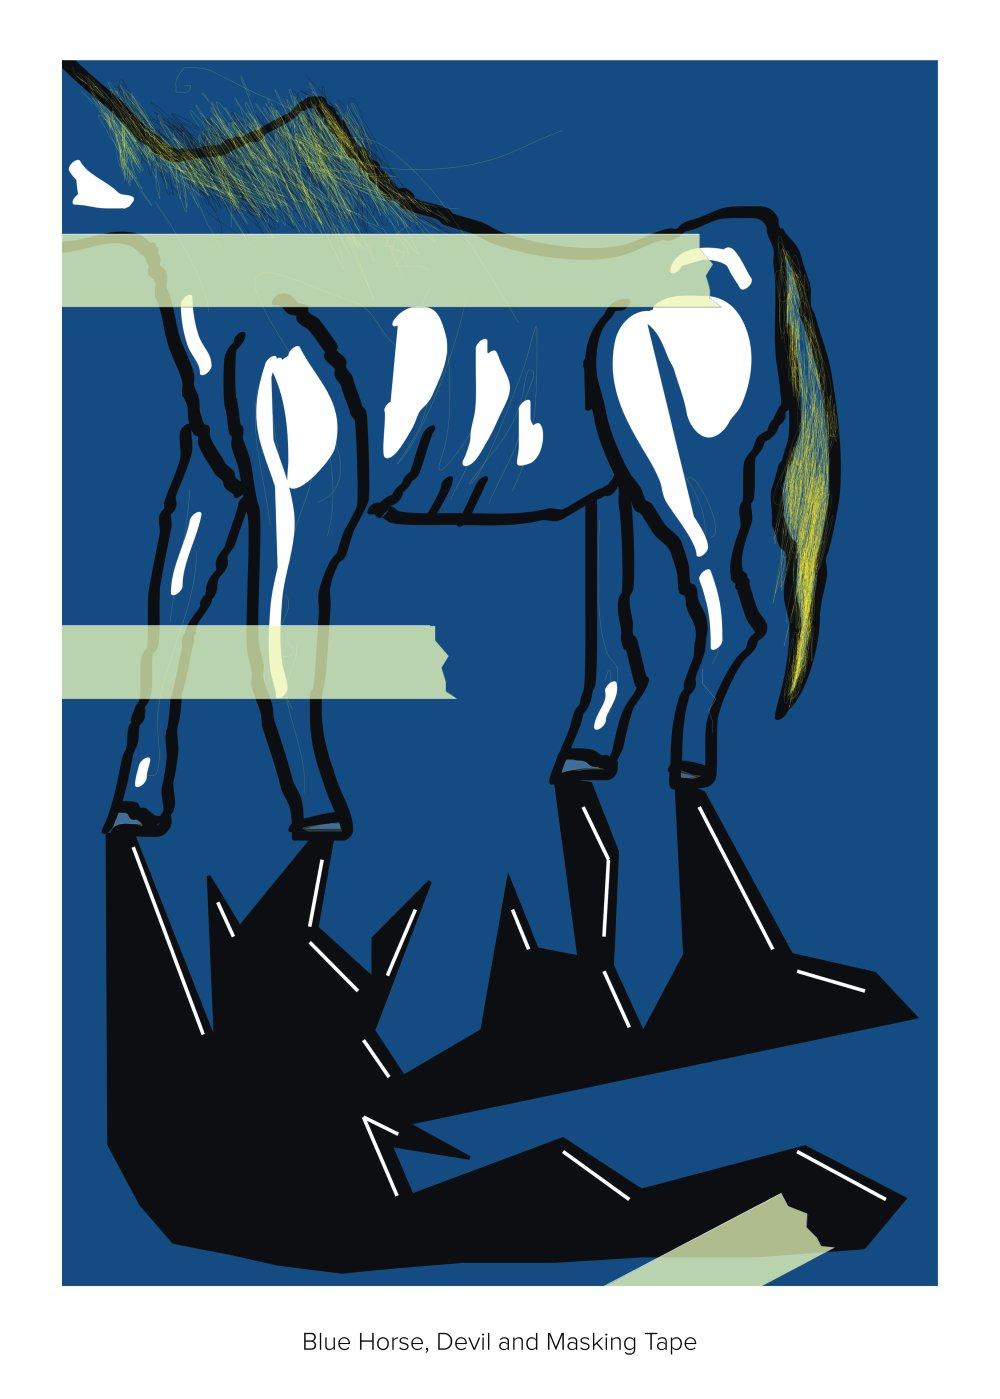 blue horse devil and masking tape